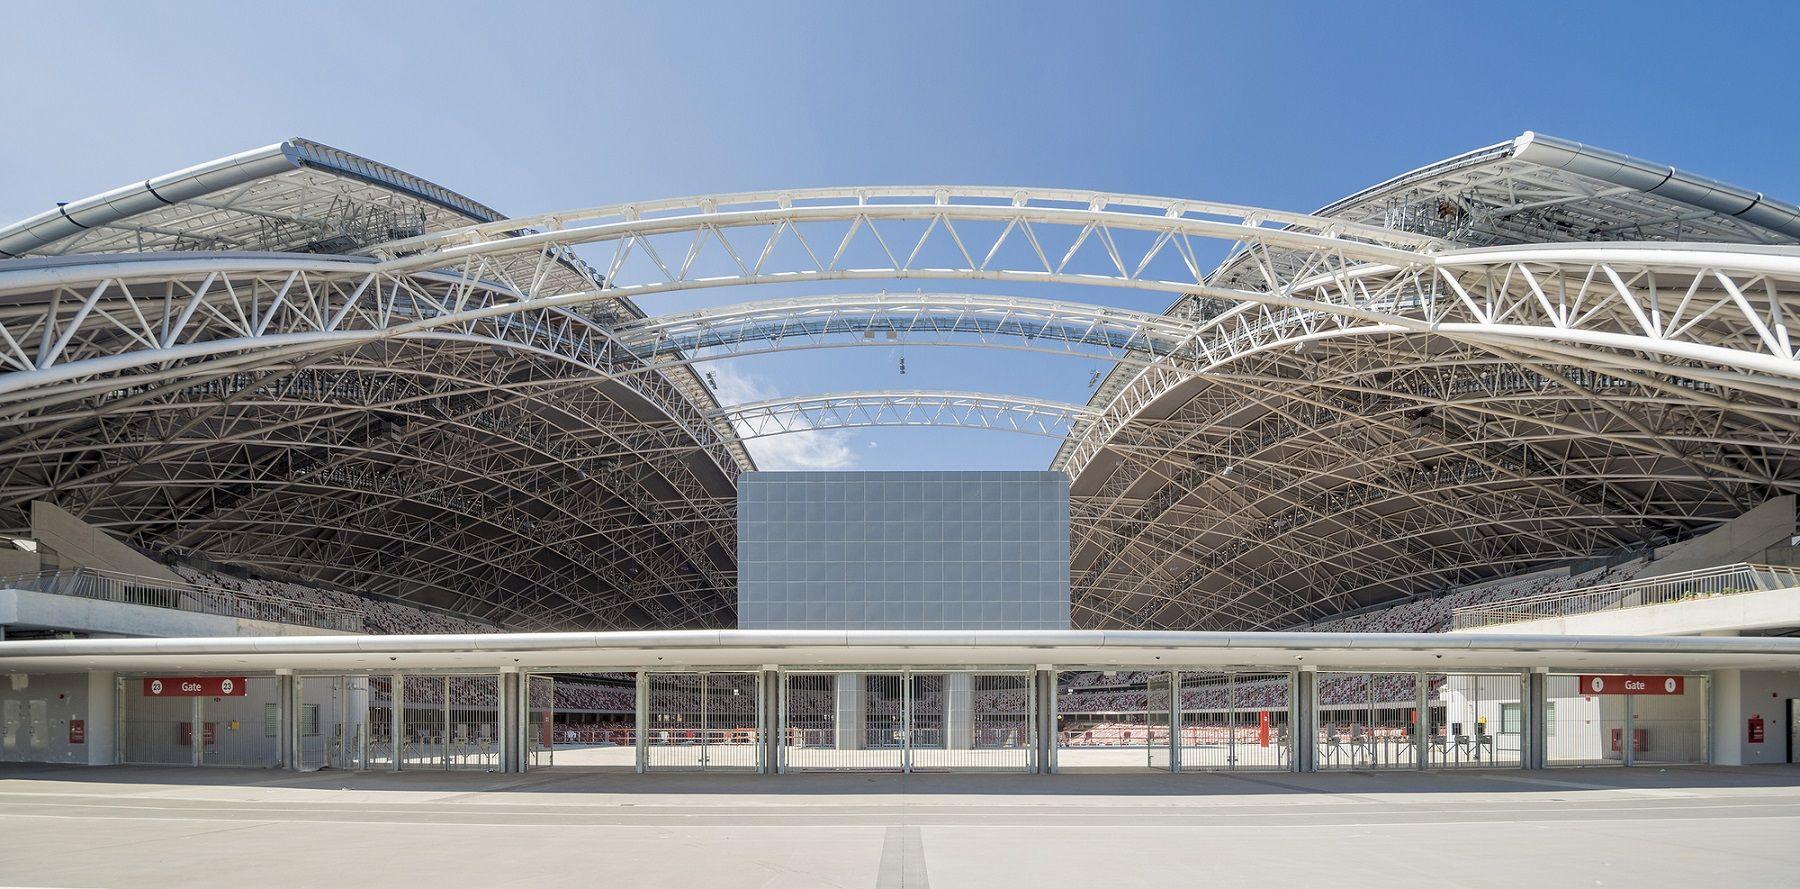 Centro Deportivo Singapur Dp architects, Green